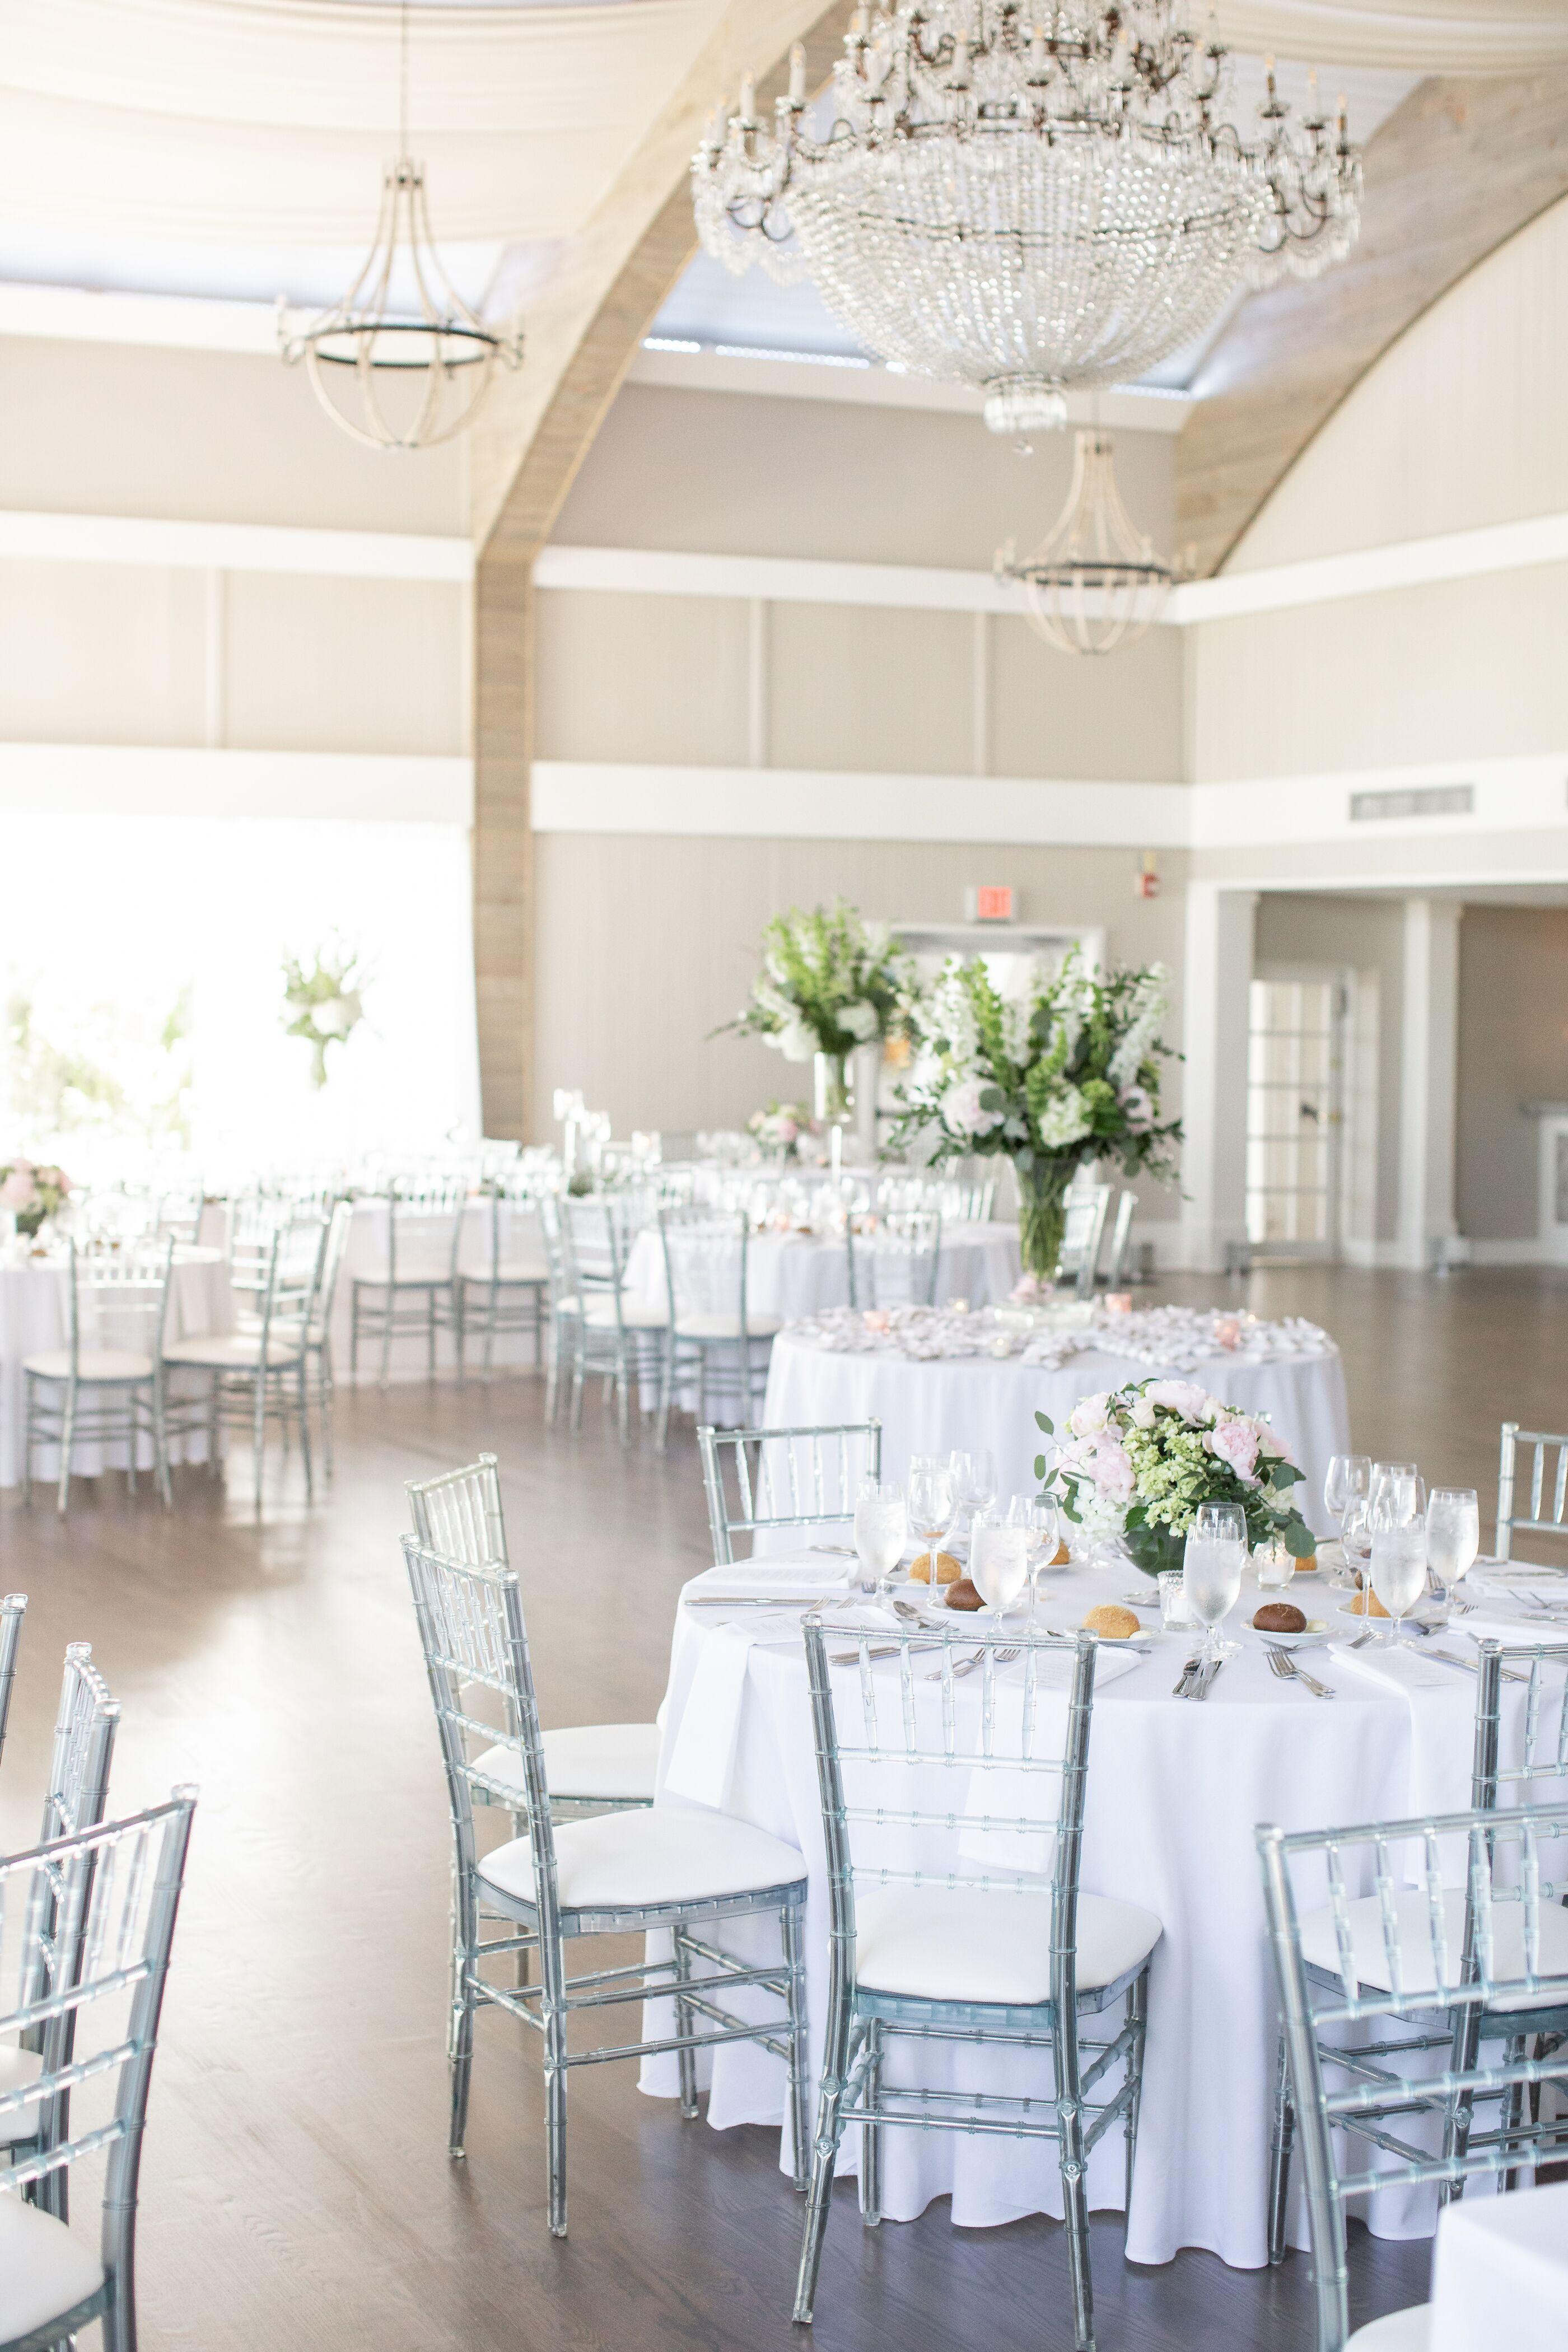 All White Indoor Hamptons Wedding Reception At Oceanbleu In Westhampton Beach New York Dream Turned Rea Hamptons Wedding Beach Theme Wedding Indoor Reception